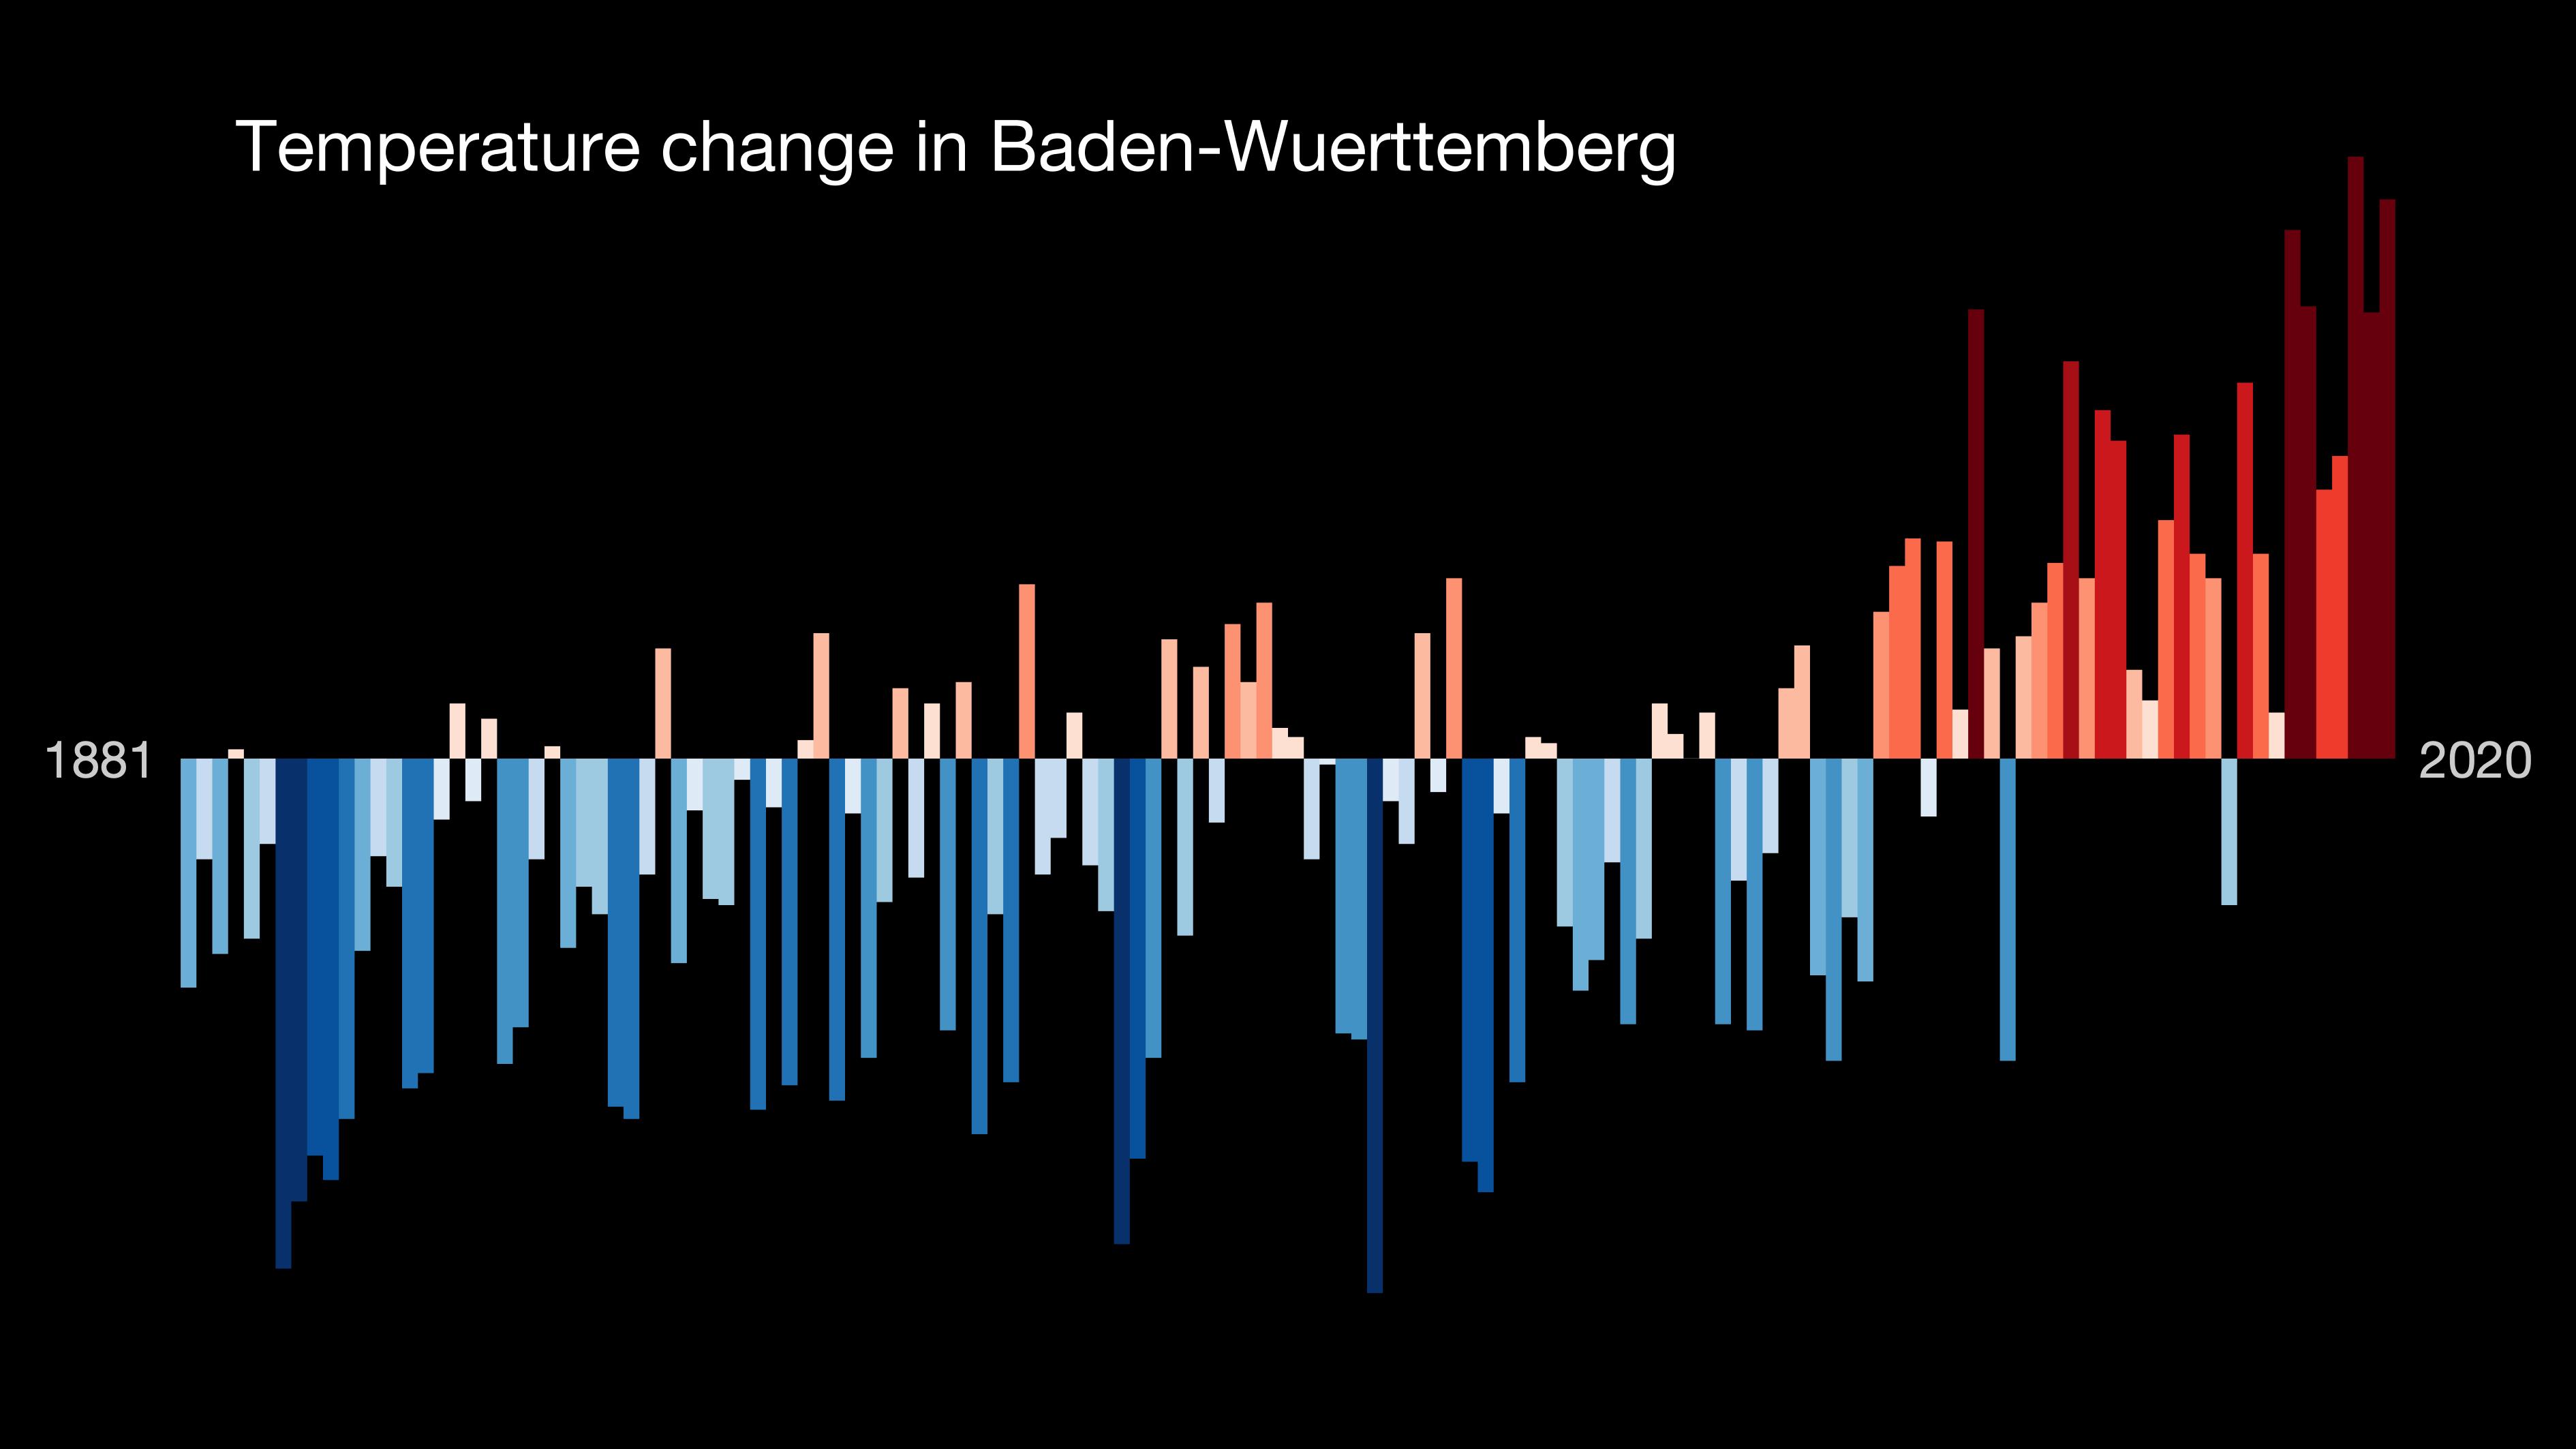 Temperaturzunahme in Baden-Württemberg. © Prof. Ed Hawkins (University of Reading) · www.showyourstripes.info